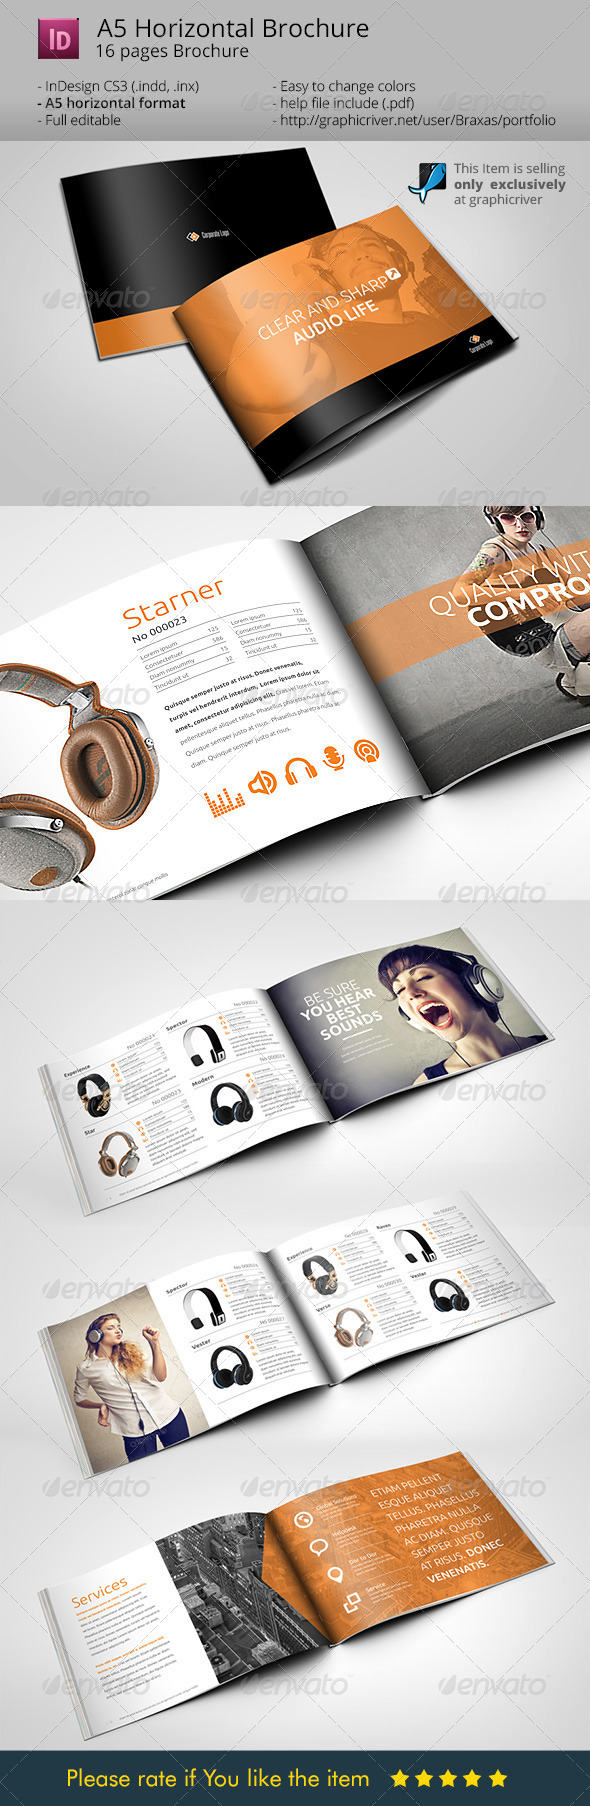 horizontal brochure template horizontal brochure a5 audio life by braxas graphicriver